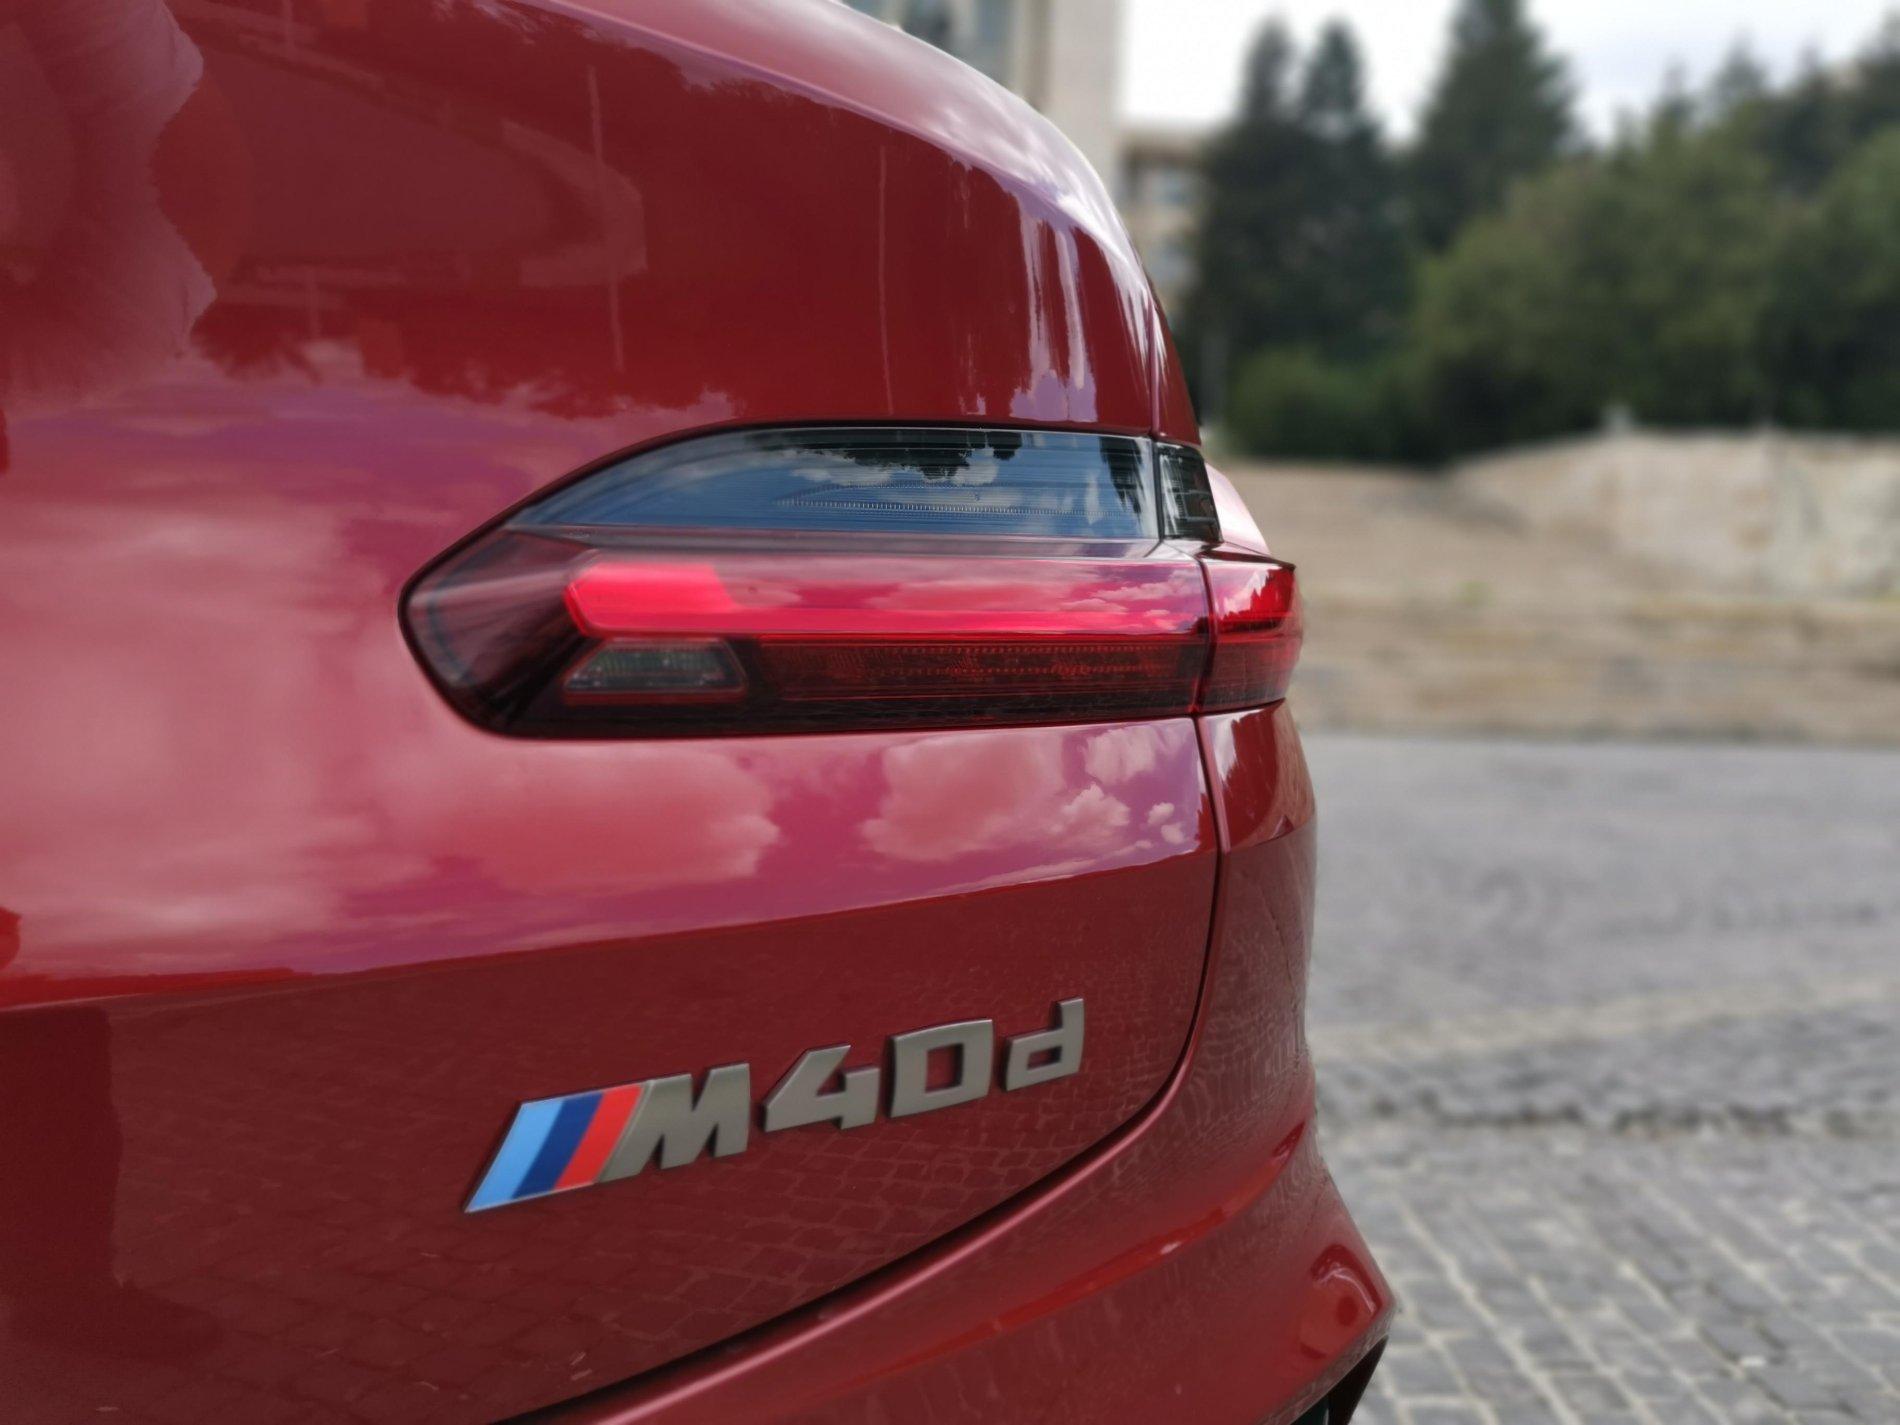 BMW X4 M40d - BMW X4 M40d